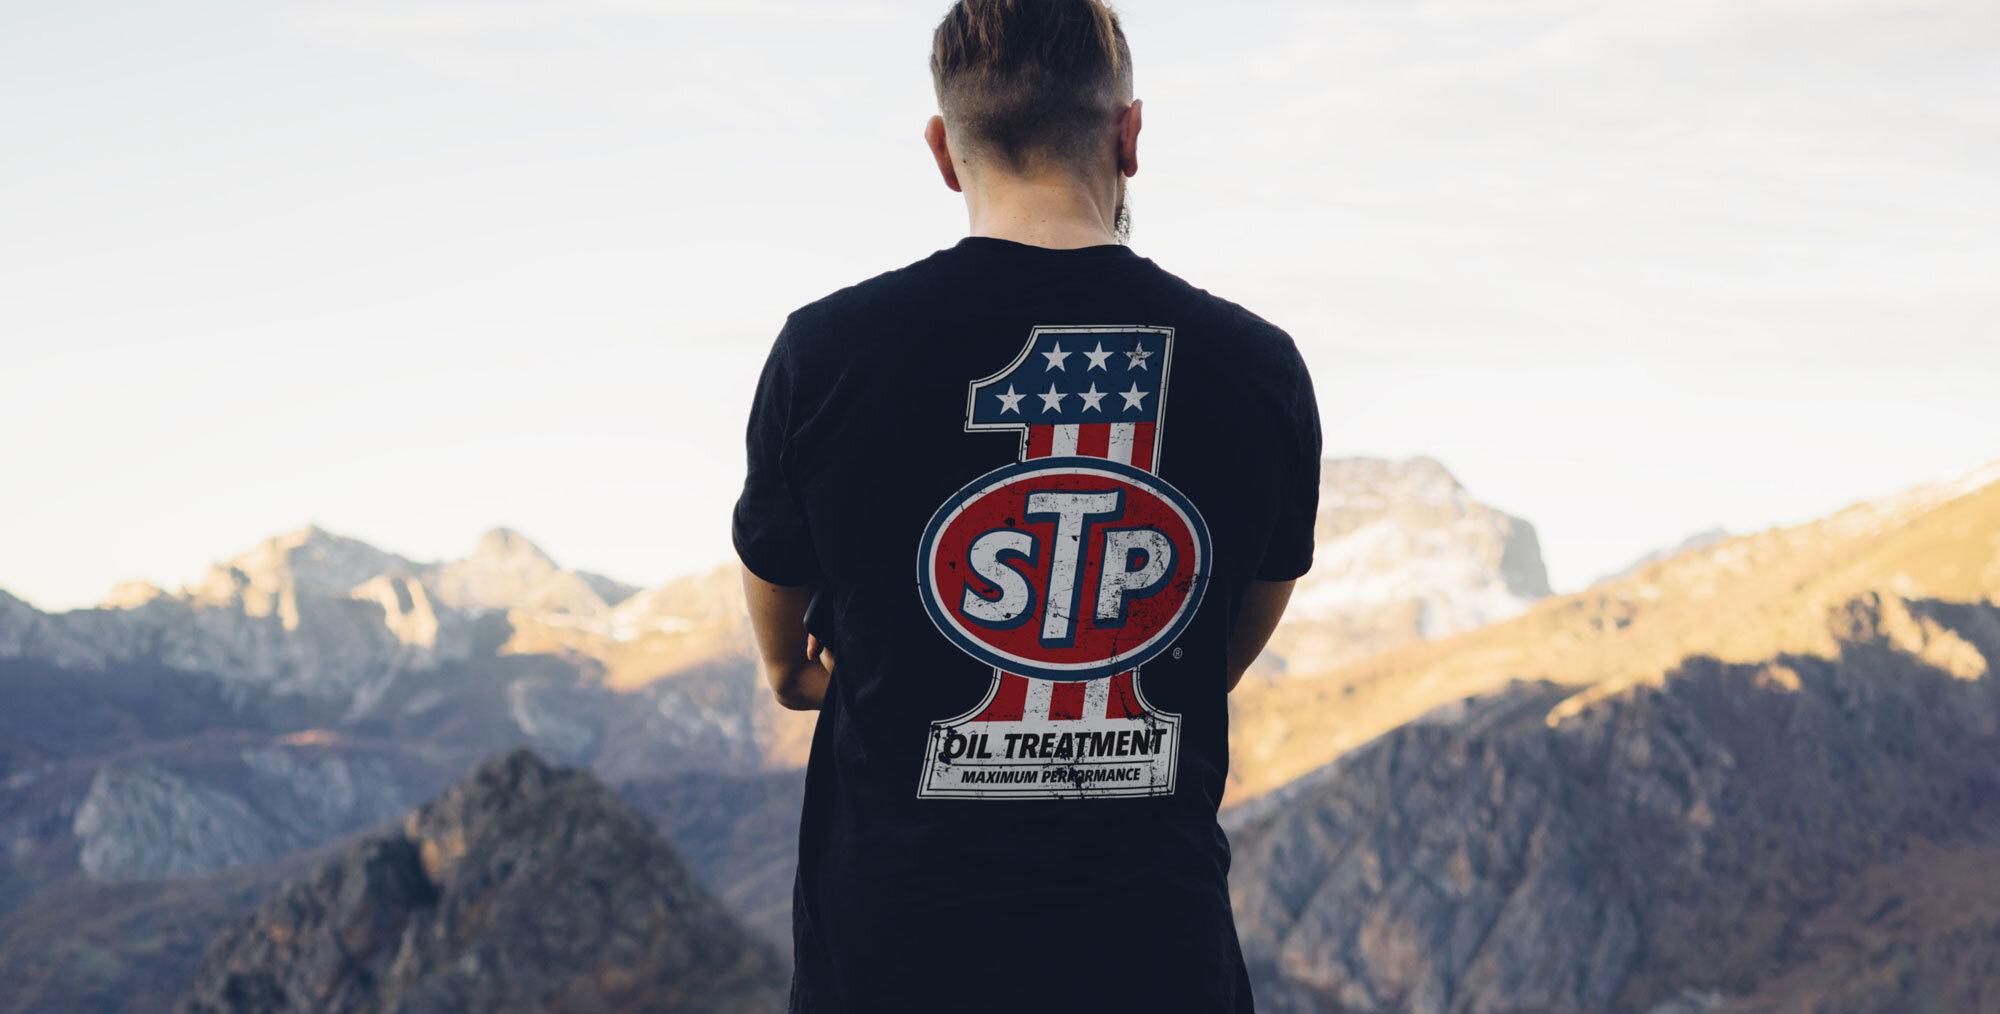 https://www.shirt-store.com/pub_docs/files/Startsida2020/STP-BIG.jpg